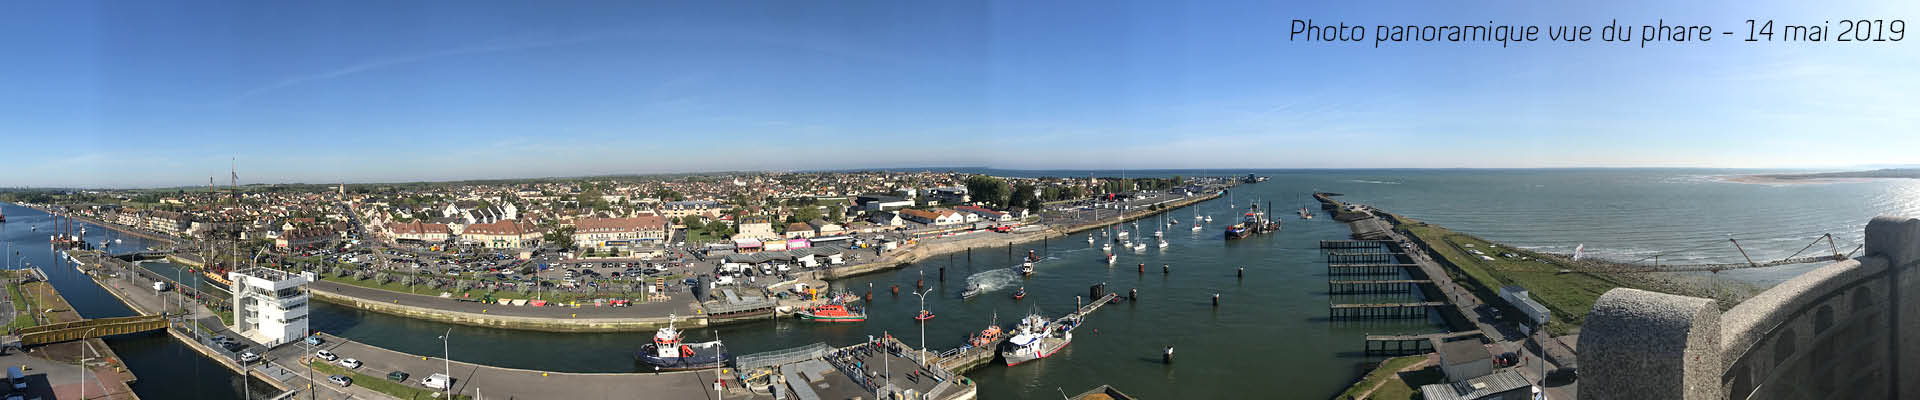 Ouistreham Riva-Bella vue du phare